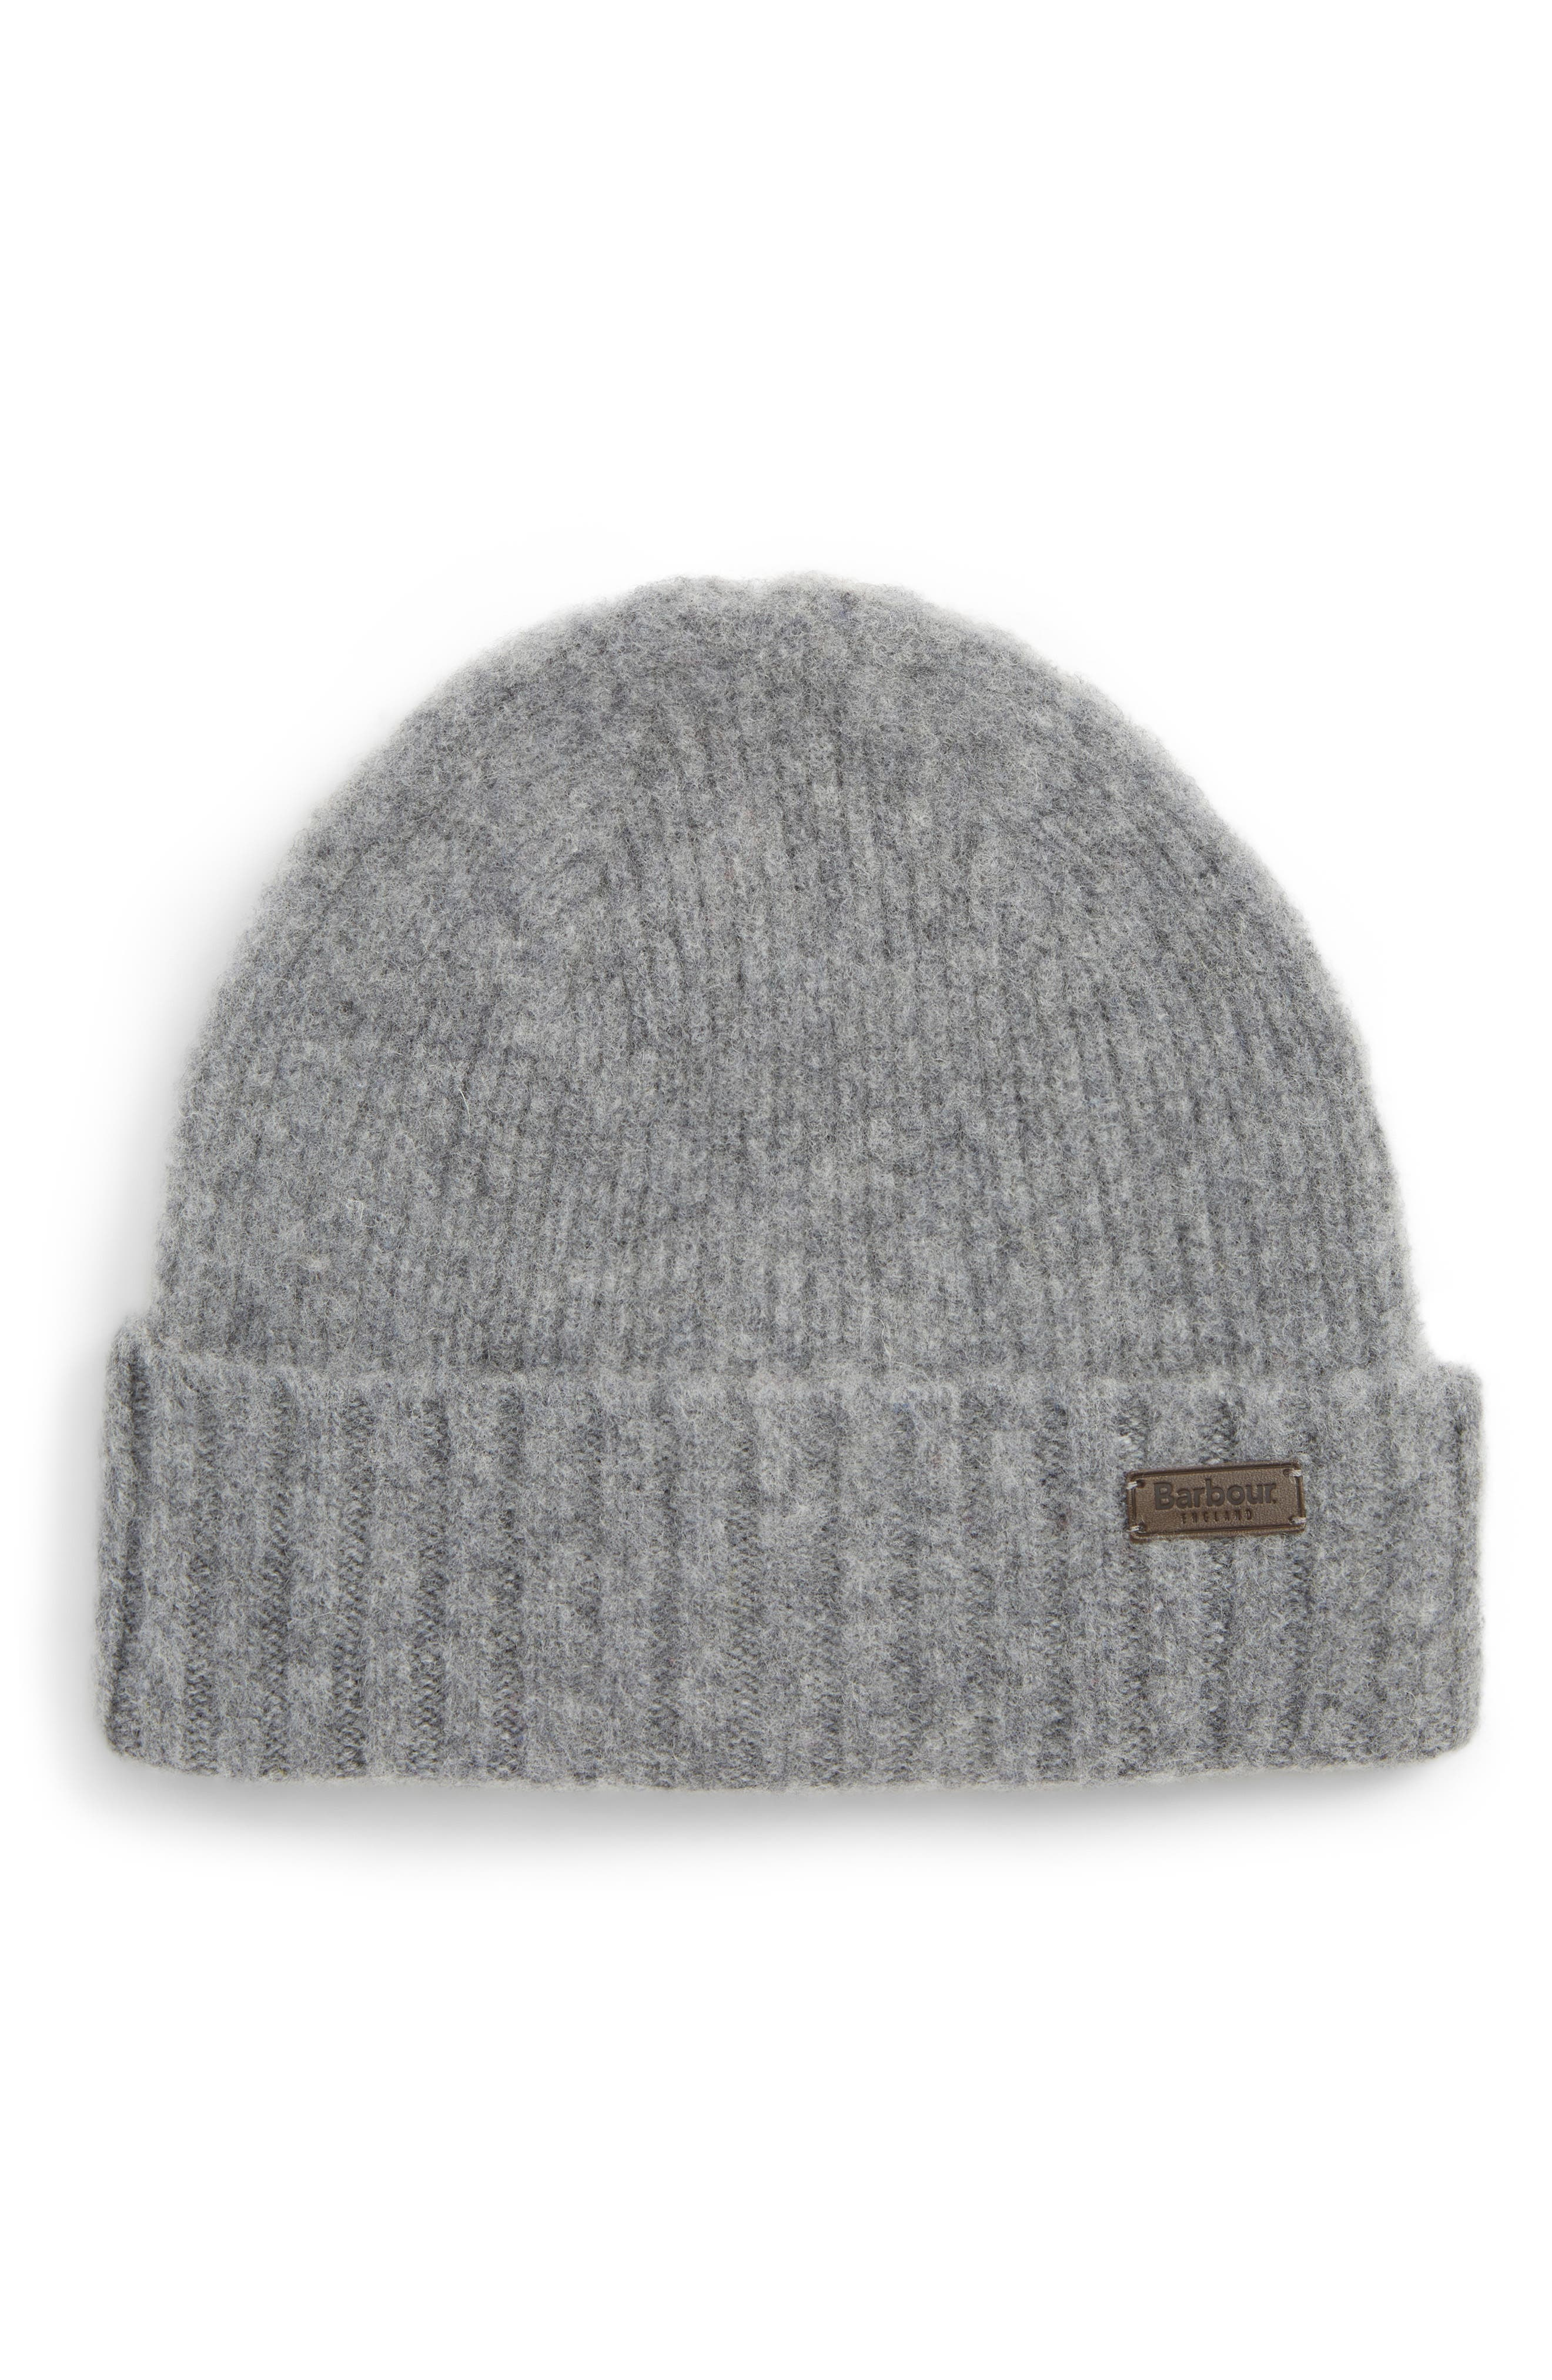 Danby Beanie Hat,                         Main,                         color, GREY